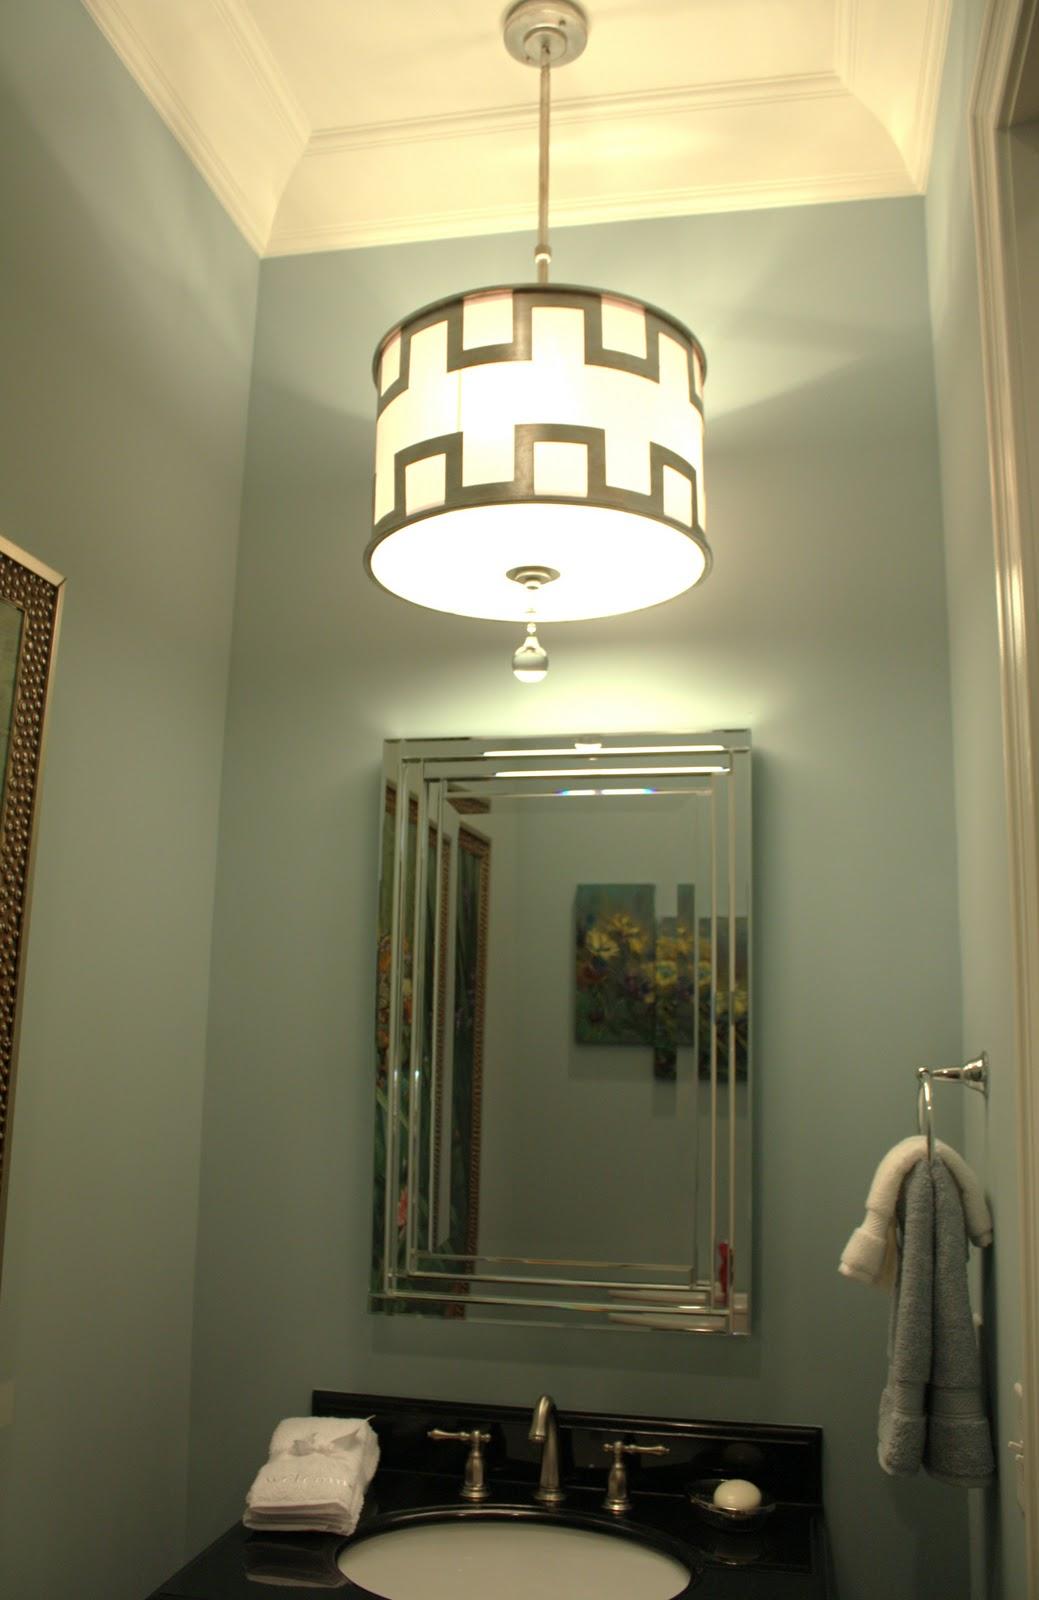 Powder Room Decor: A Bright Idea (for Your Powder Room)